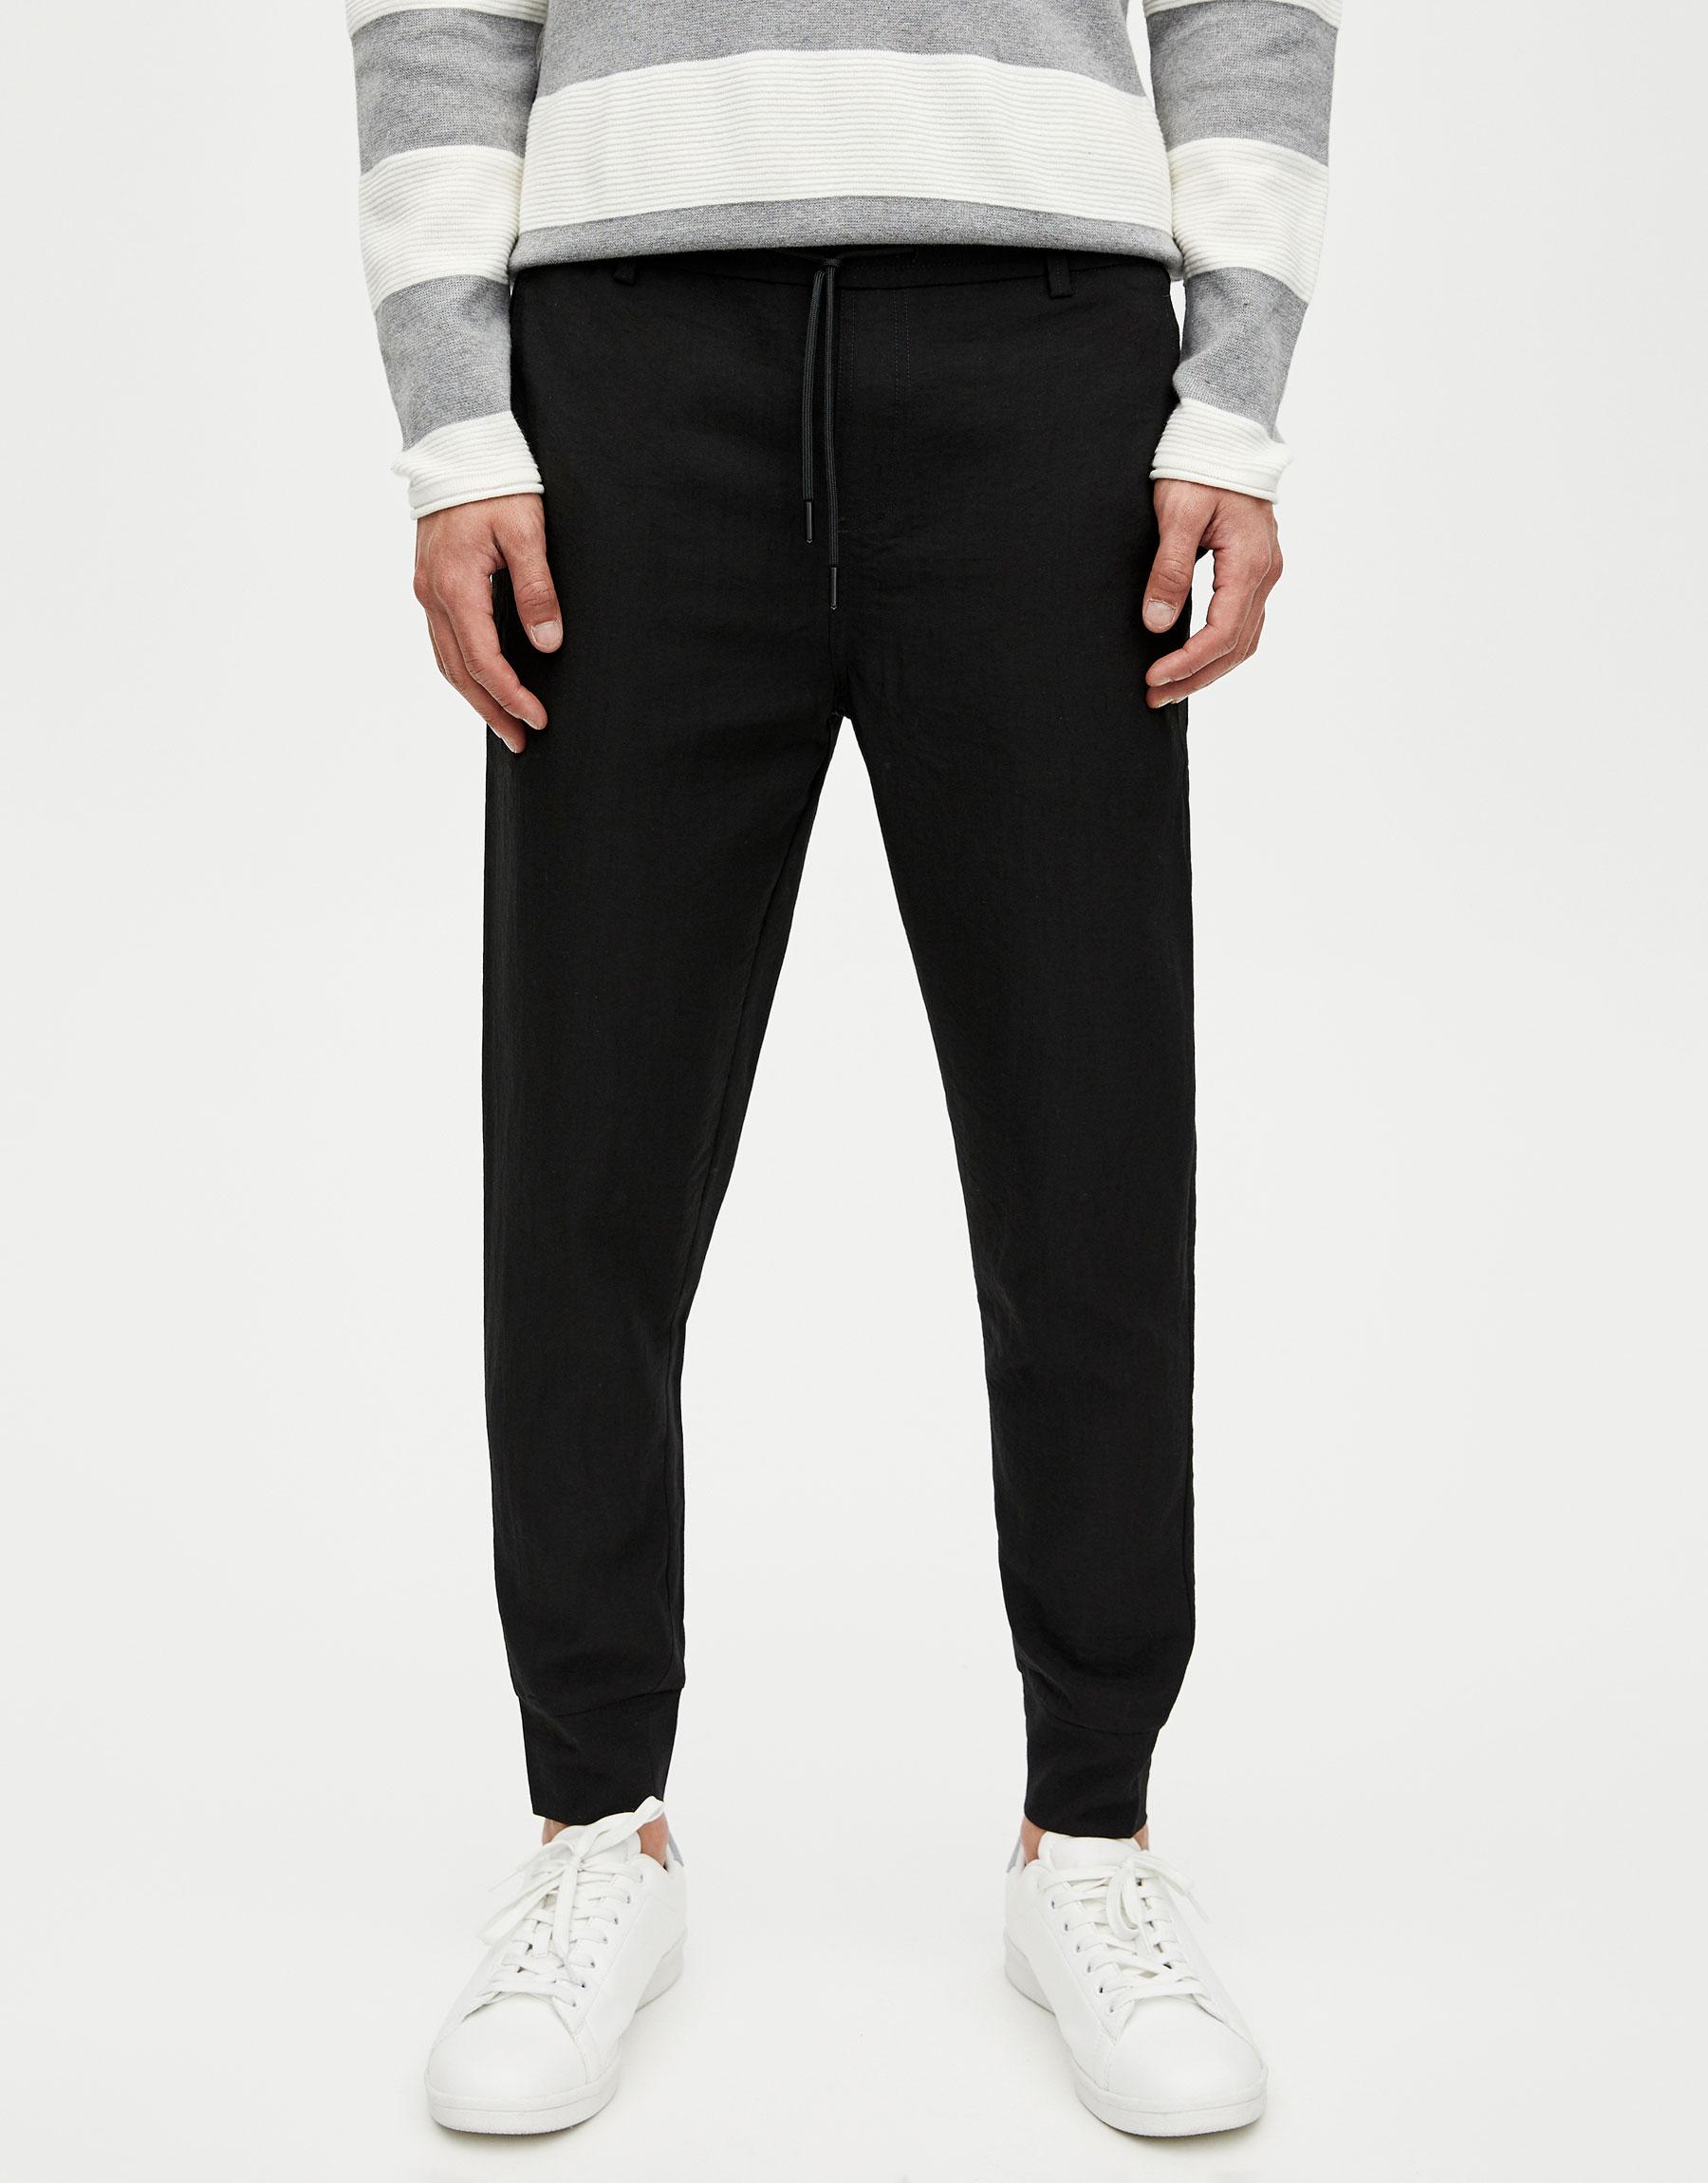 cbf79a4692 Modalite - Pullbear Light beach pants